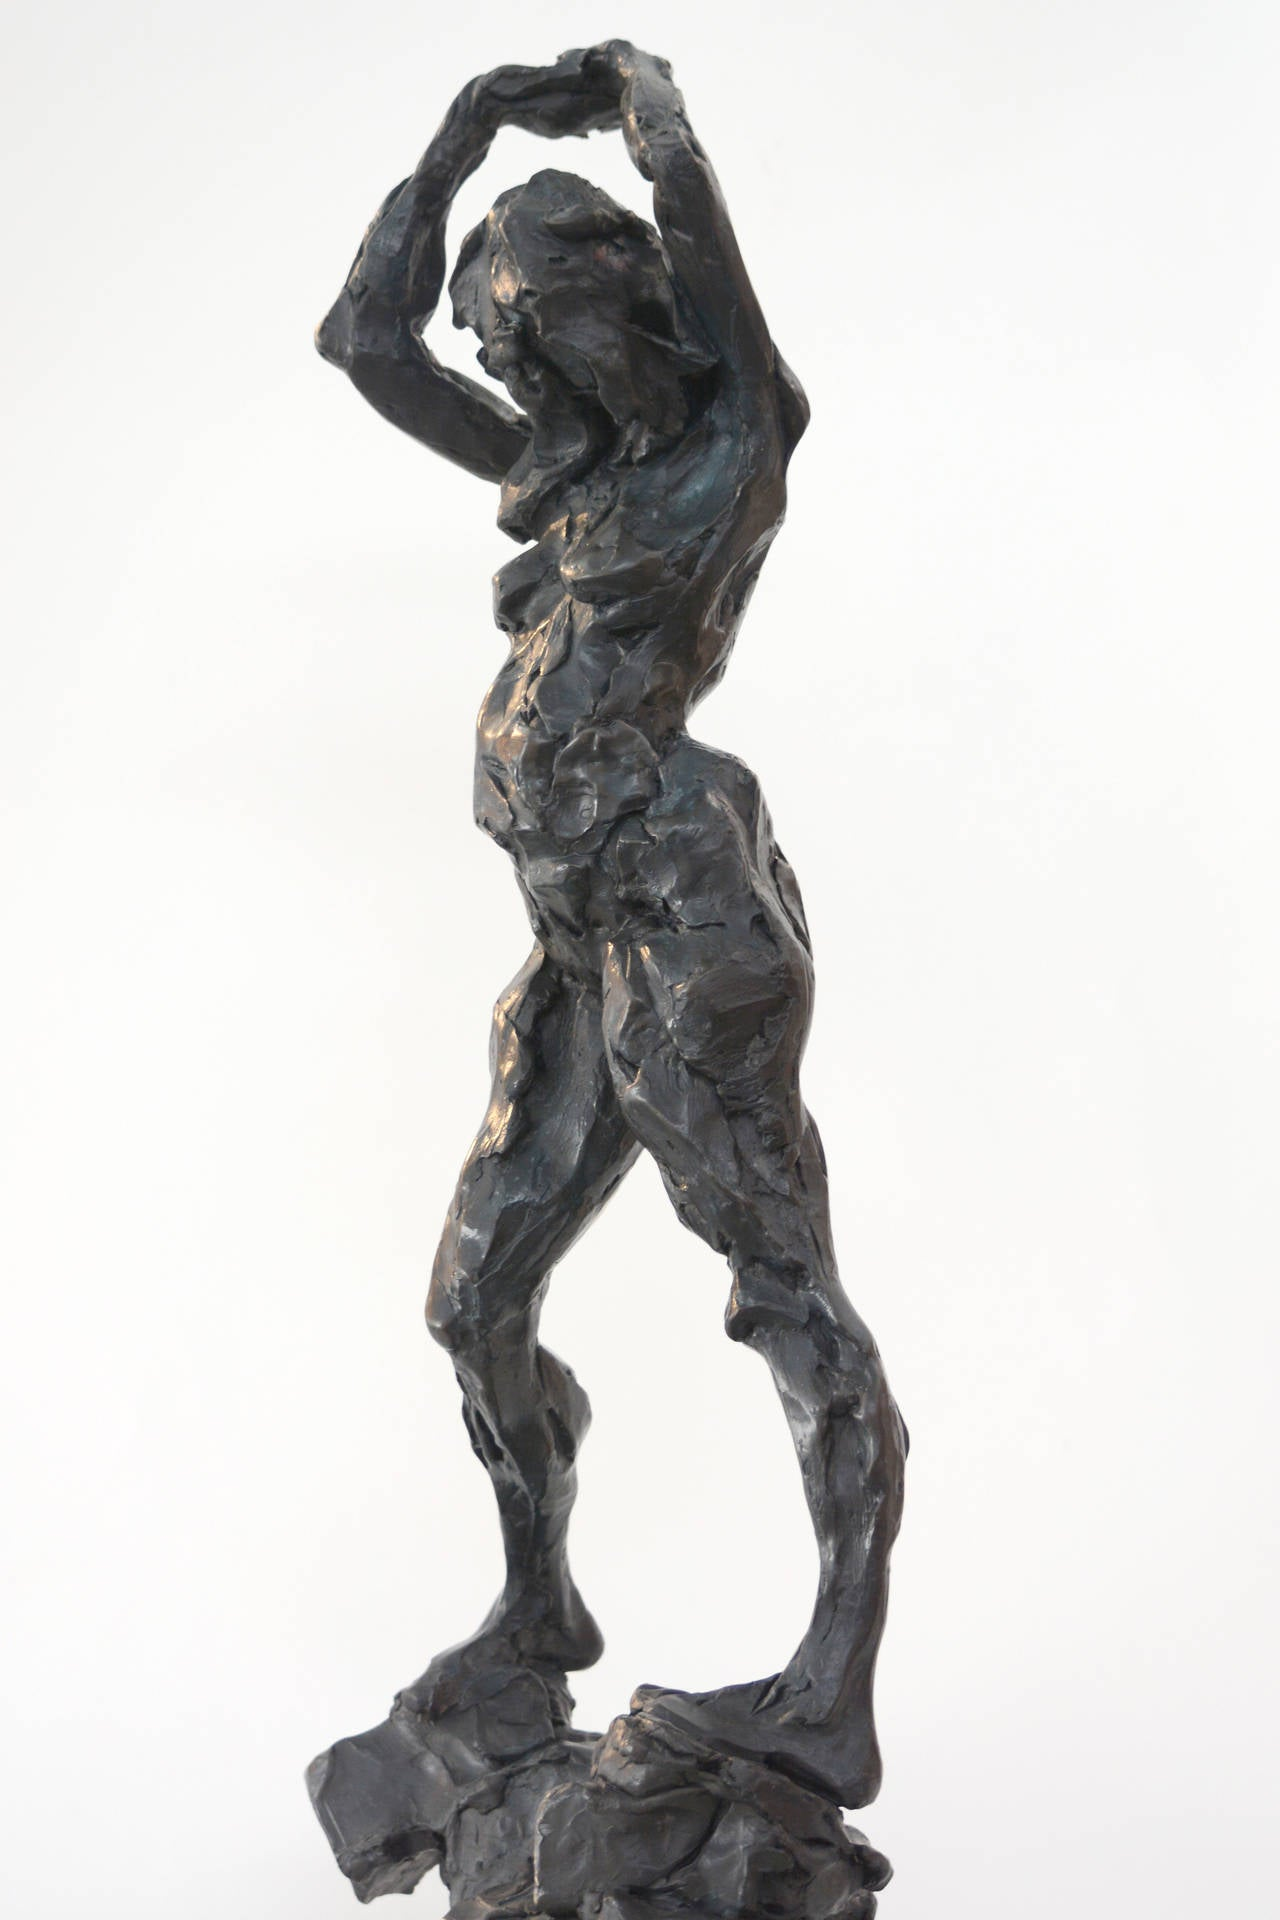 Sculpture #14